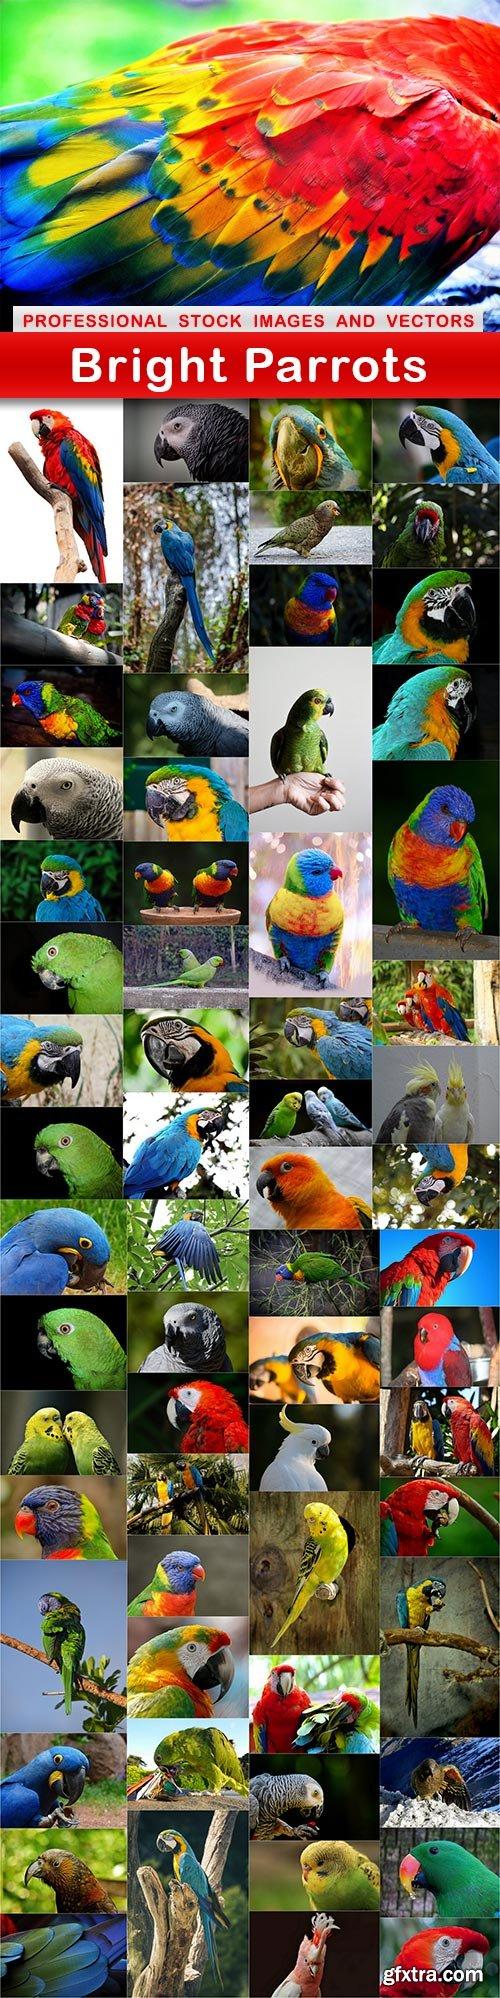 Bright Parrots - 65 UHQ JPEG